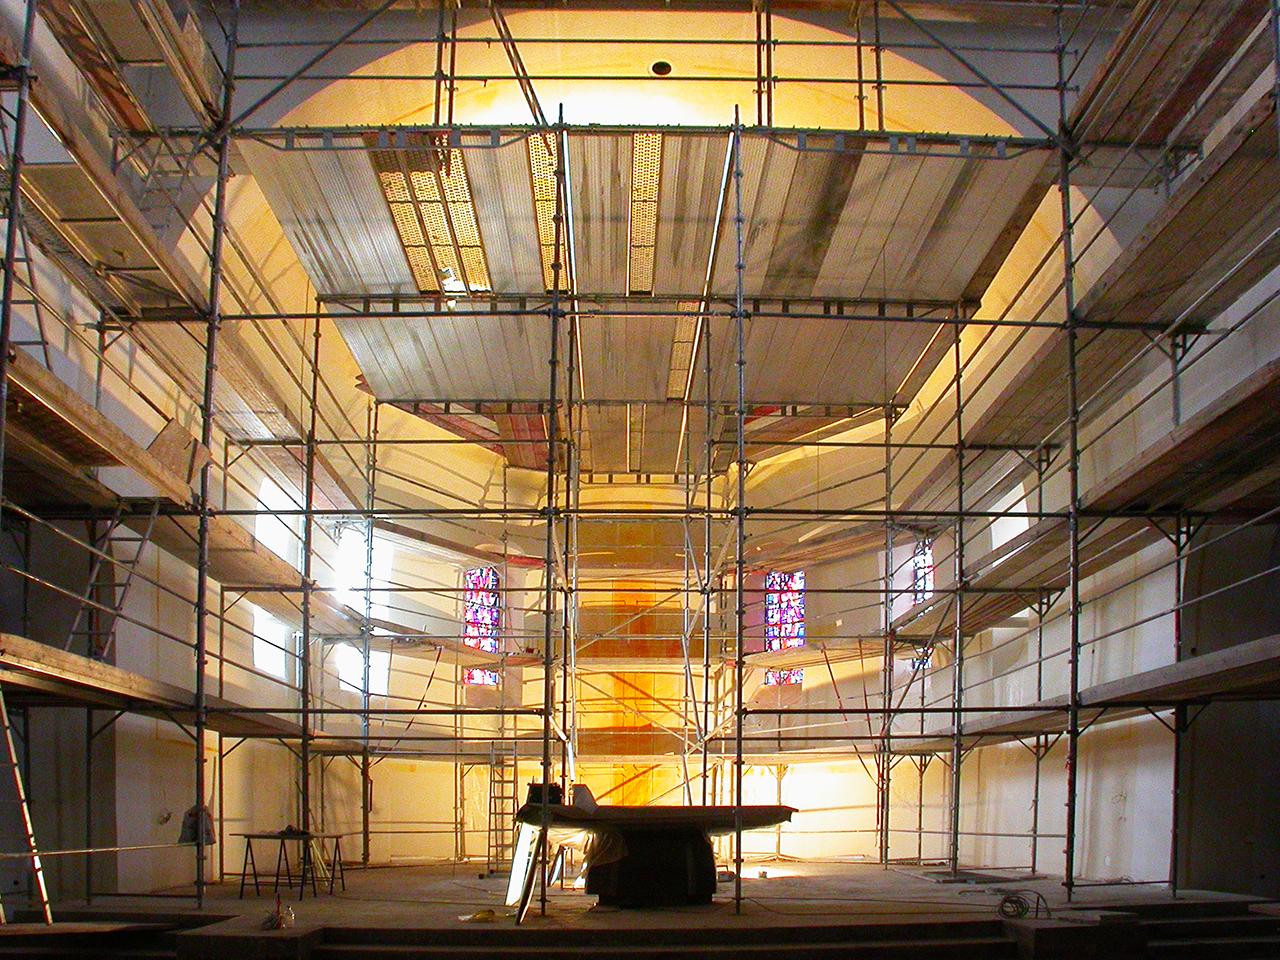 St.Martin Piesport, Altarraumgestaltung 2004